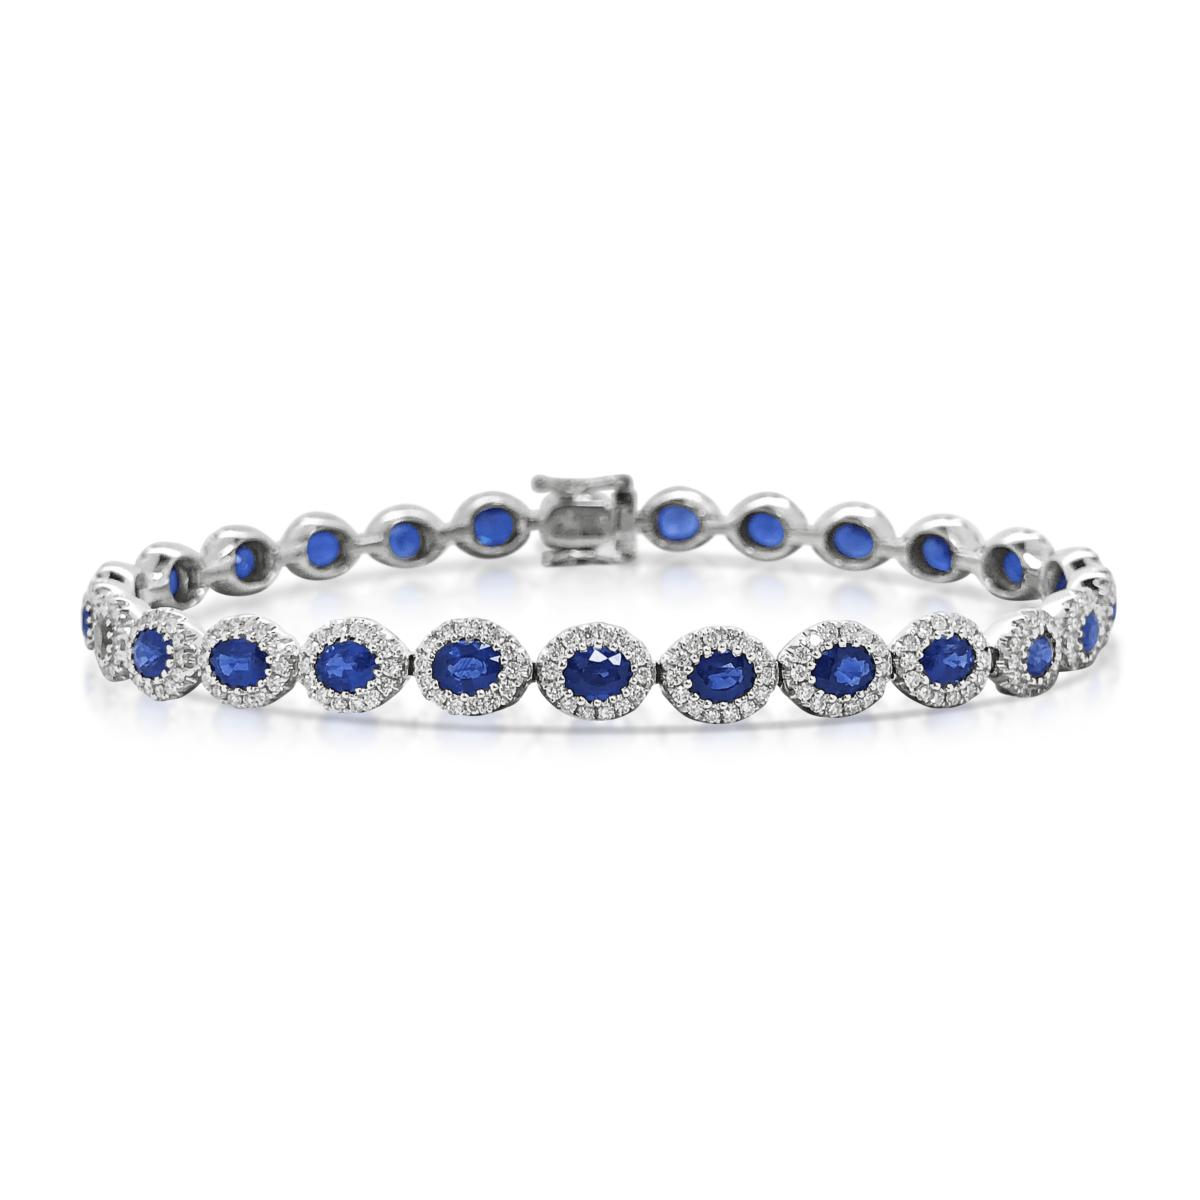 Diana Oval Blue Sapphire Halo Tennis Bracelet